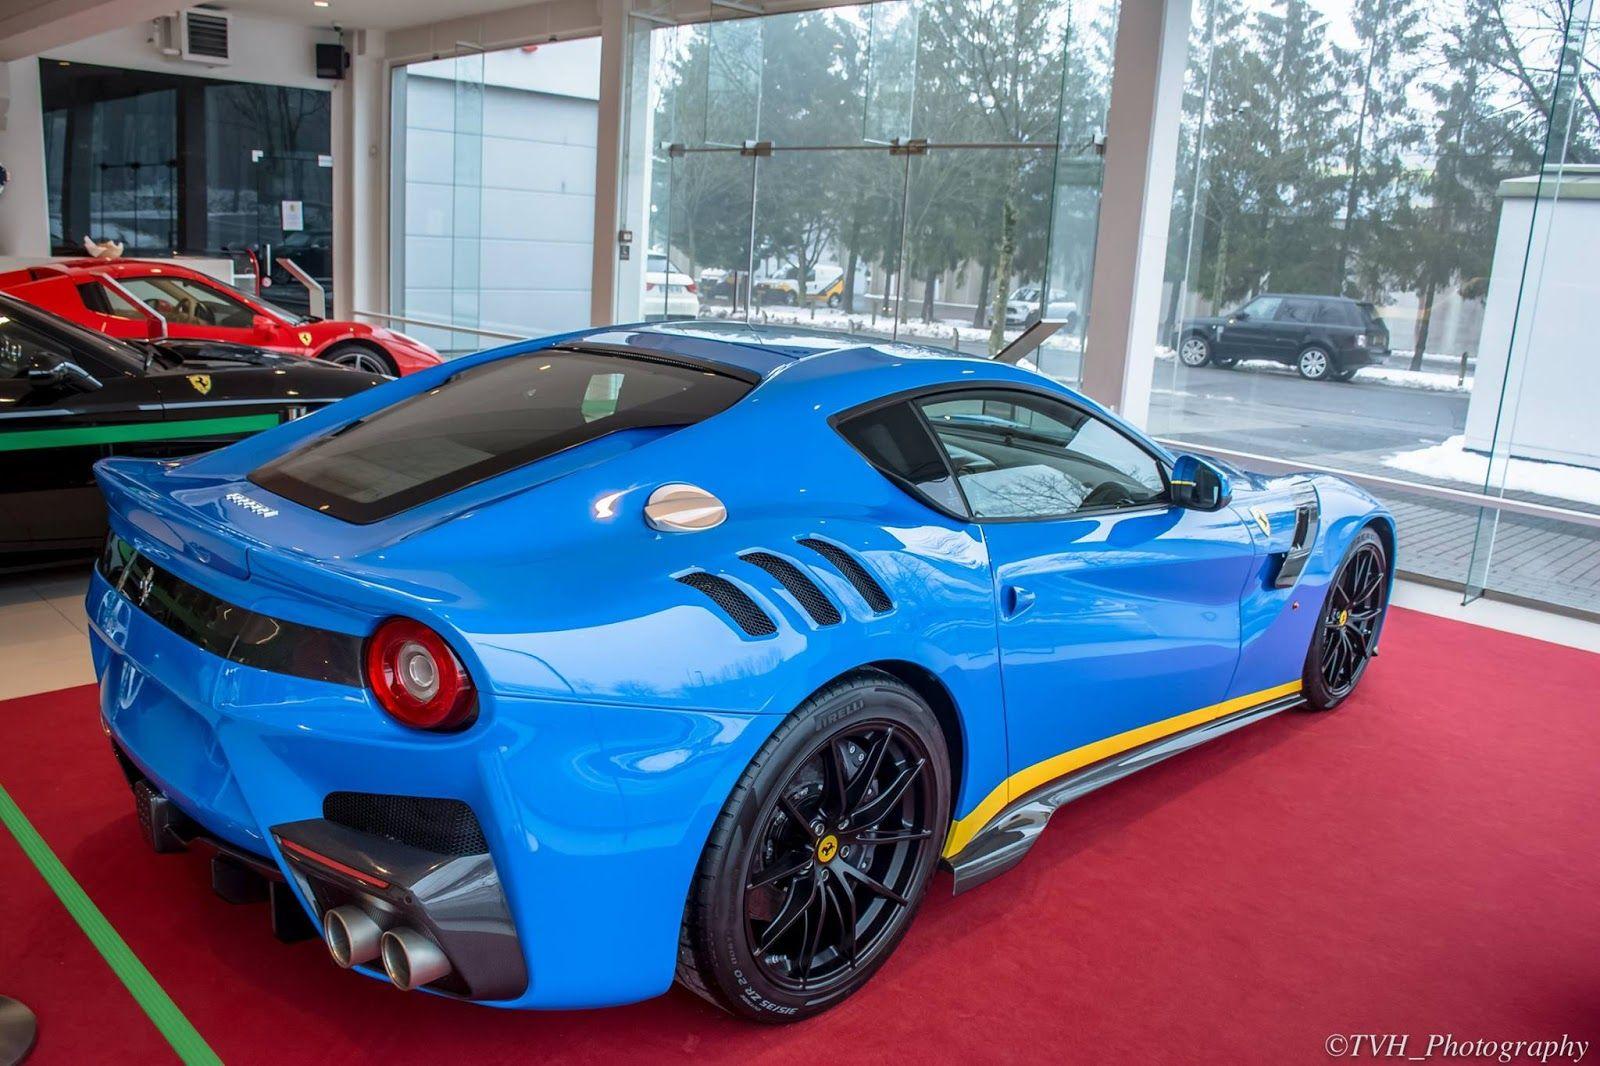 Azzurro Dino Blue Ferrari F12tdf Is A 770hp Smurf   Carscoops